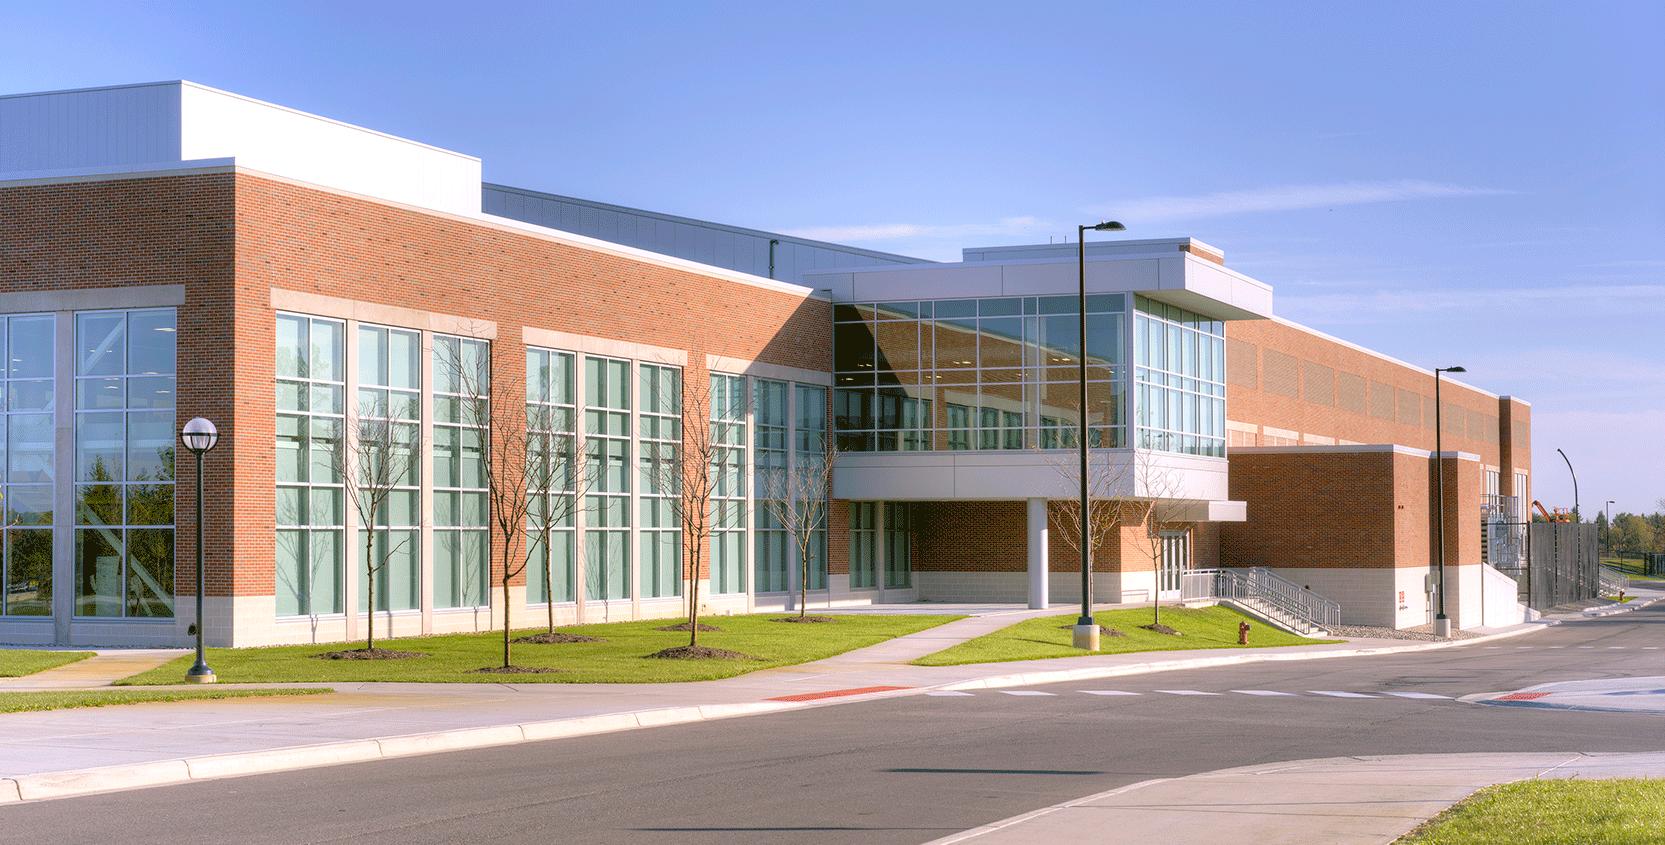 University-of-Michigan-ASCP-Exterior-2-1665x845